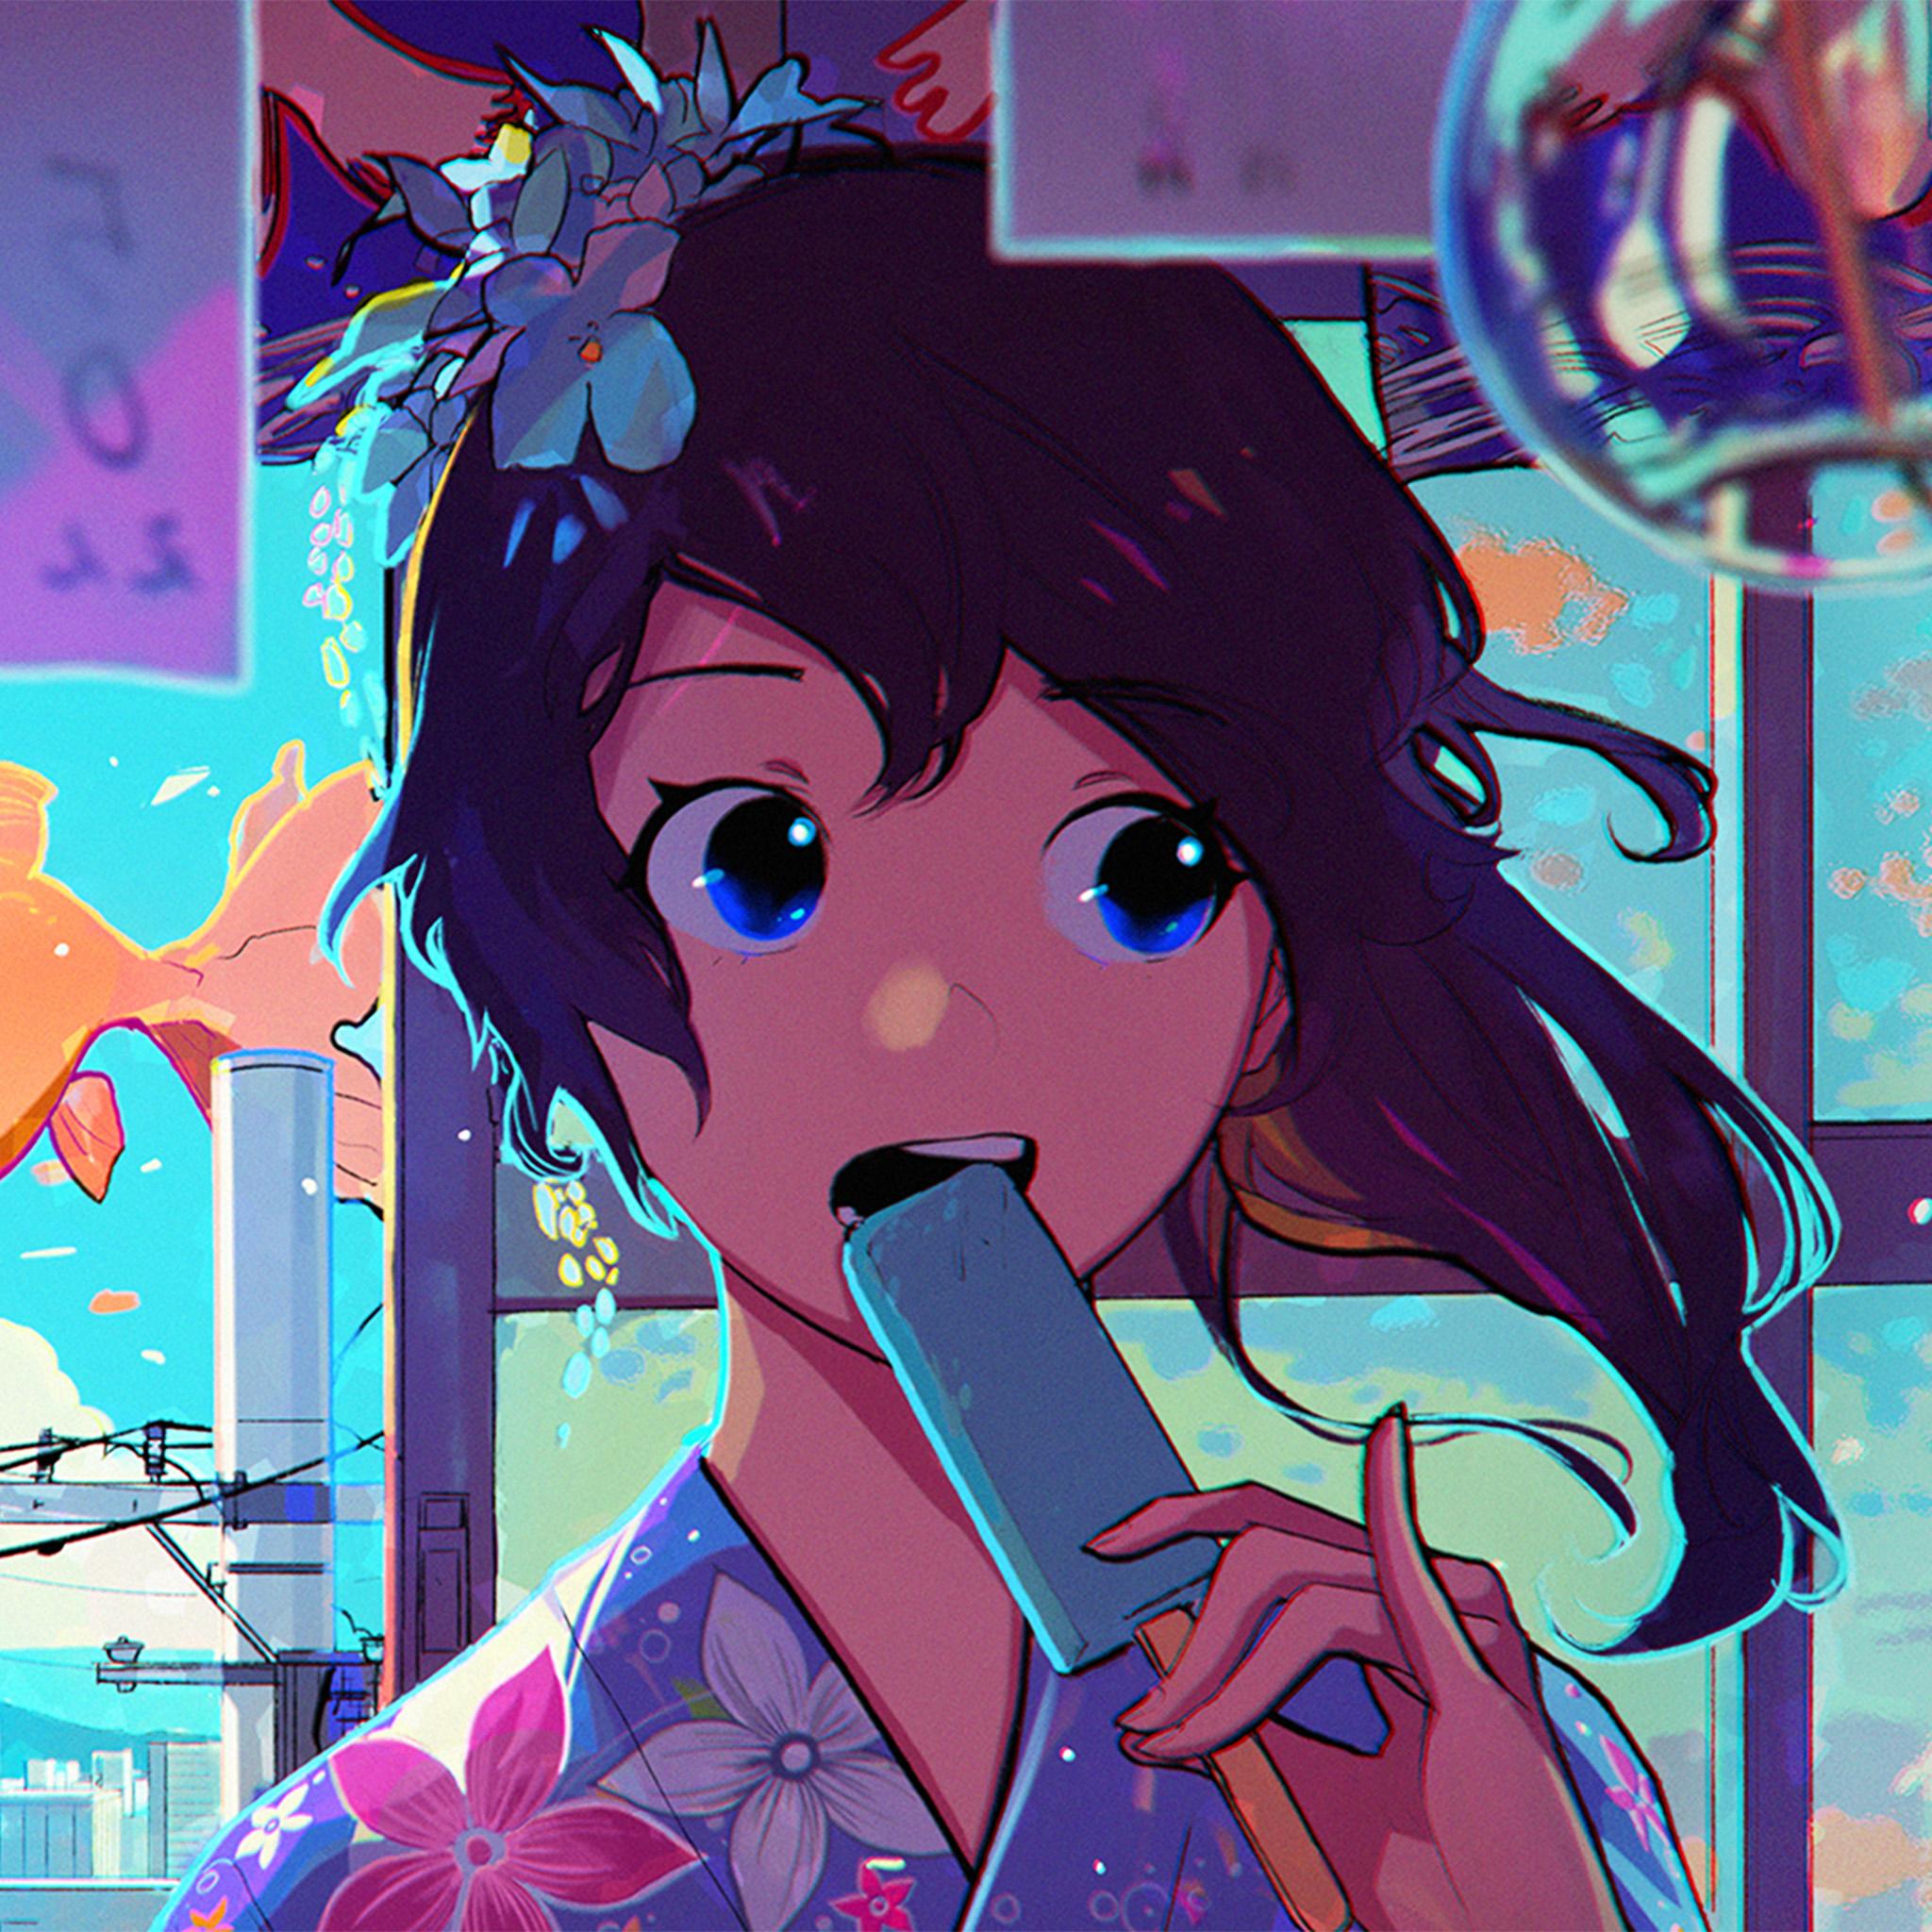 Girl And Car Iphone Wallpaper Be23 Girl Face Anime Art Illustration Wallpaper